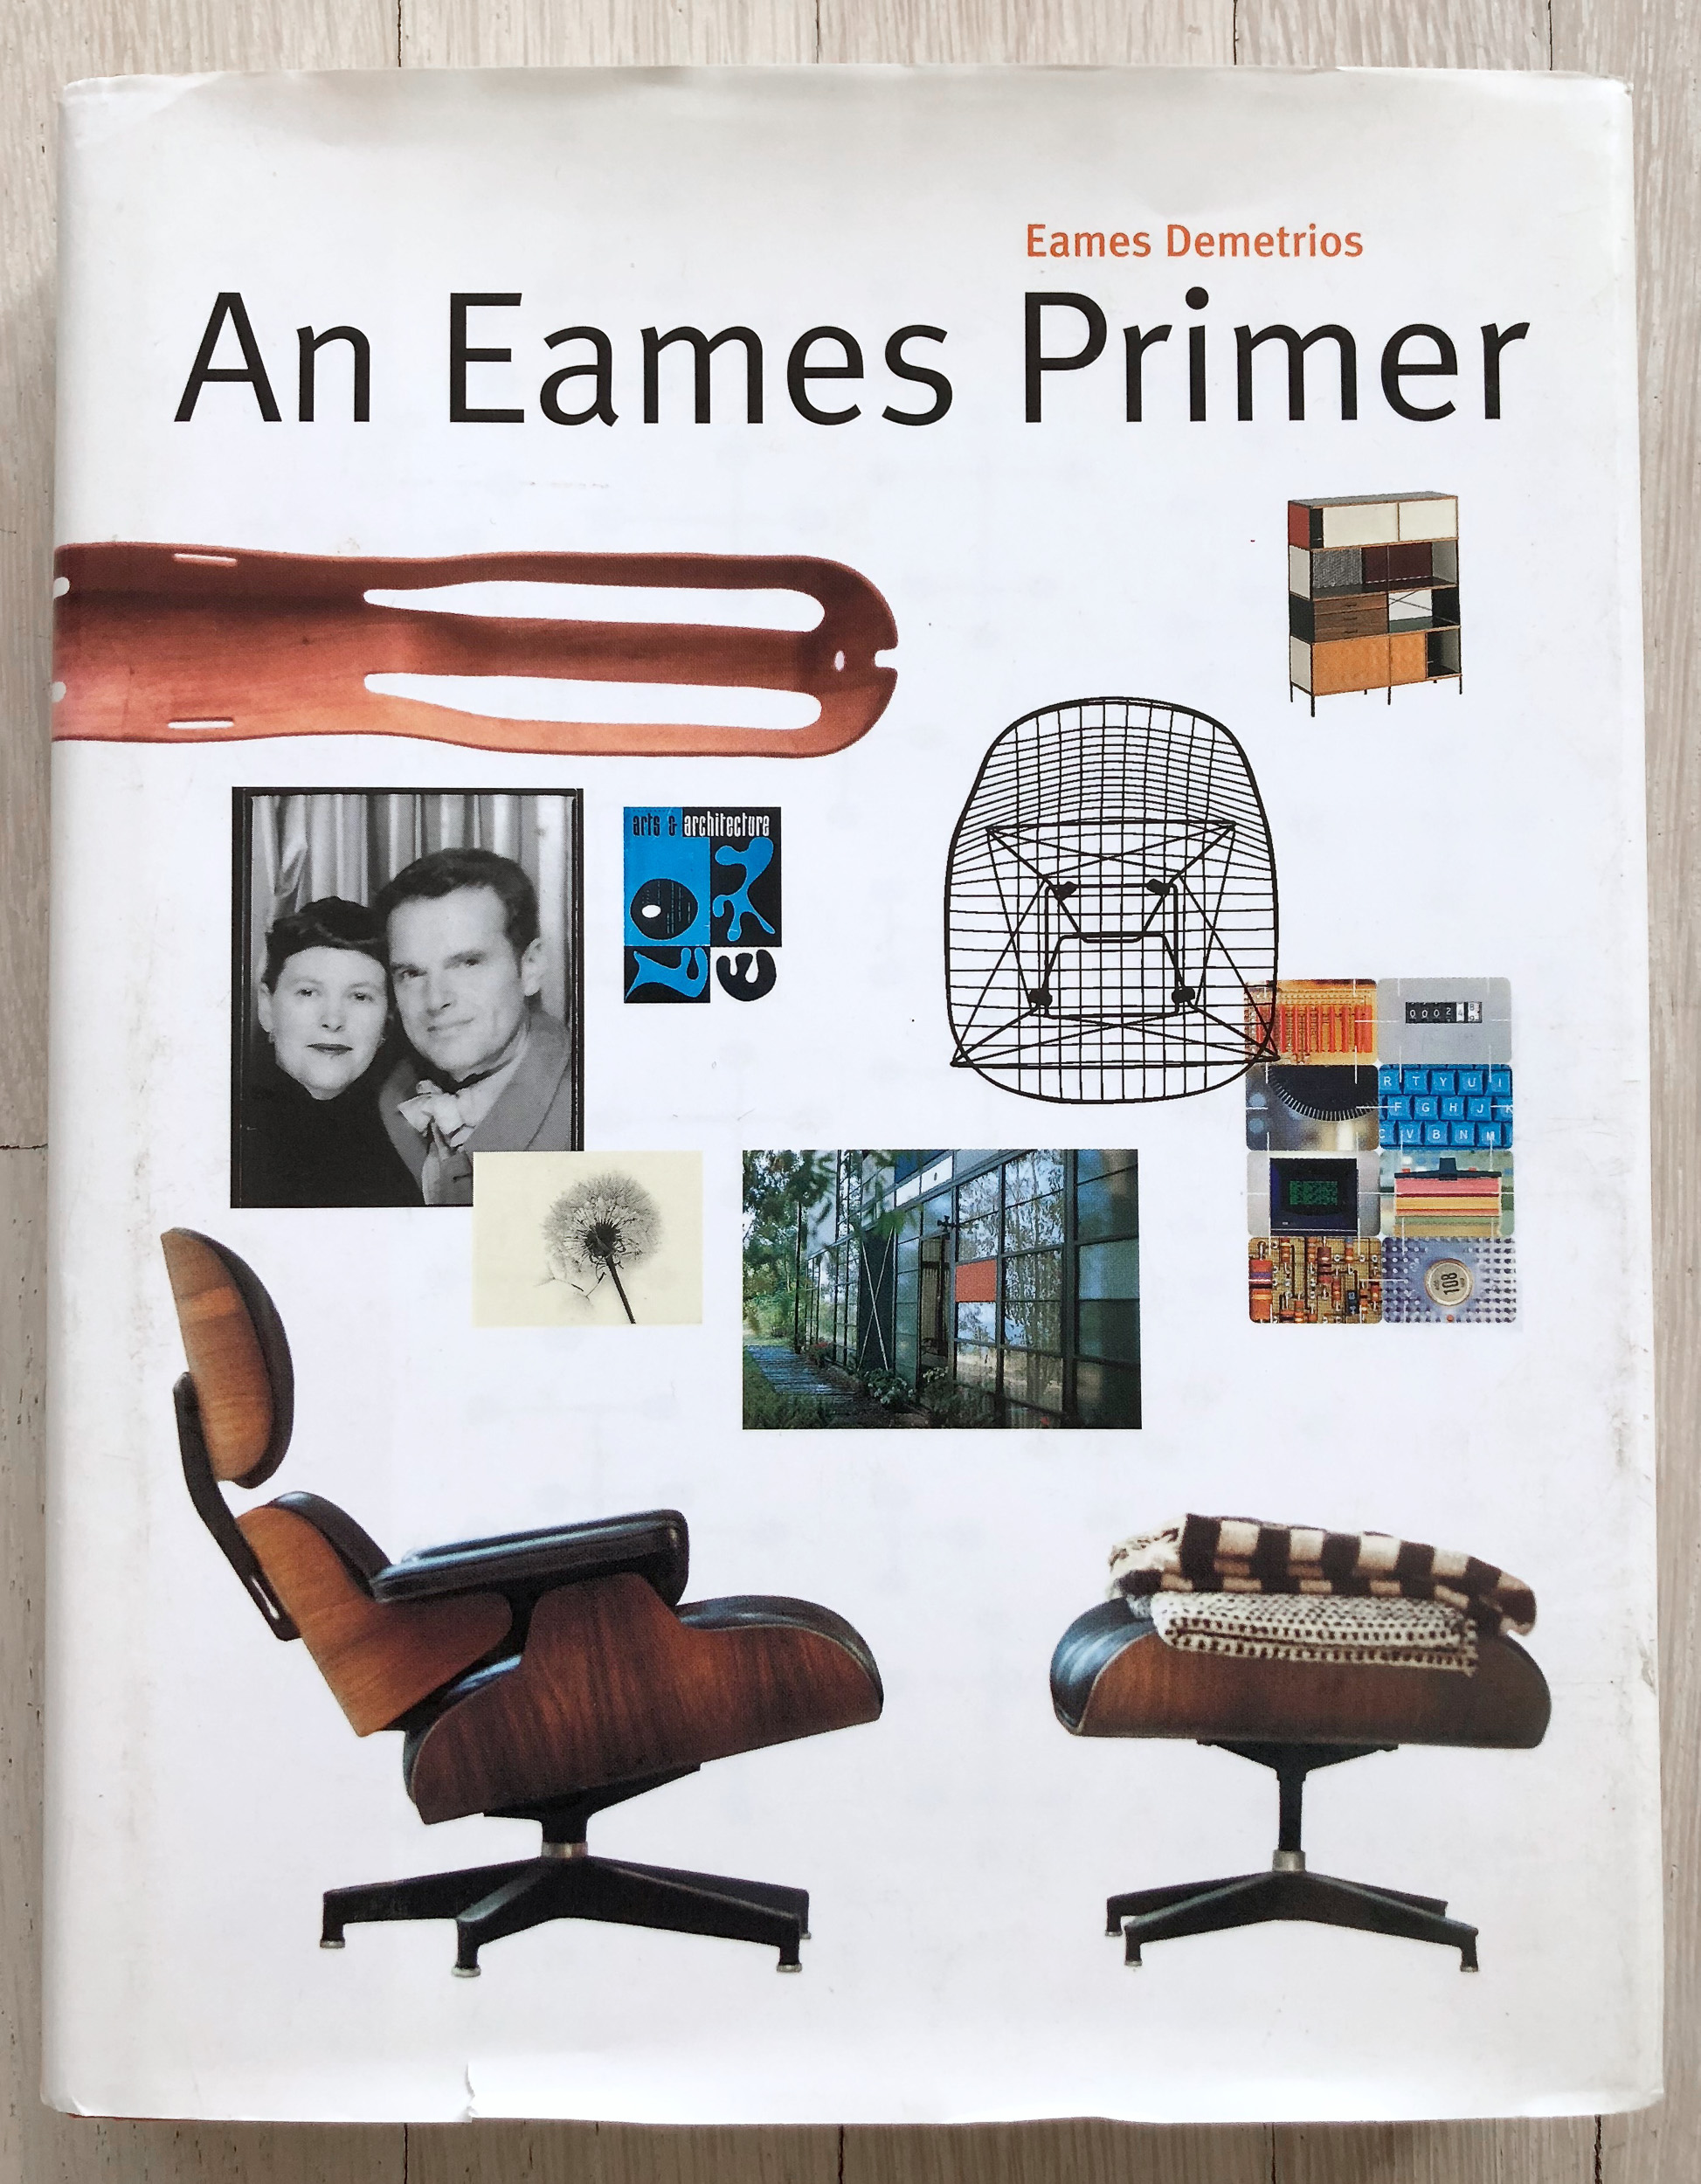 An Eames Primer  by Eames Demetrios. Editorial Concept Development by Richard Olsen. Ph.D, Graphic Design. Belinda Hellinger, Production Manager. Universe Publishing.